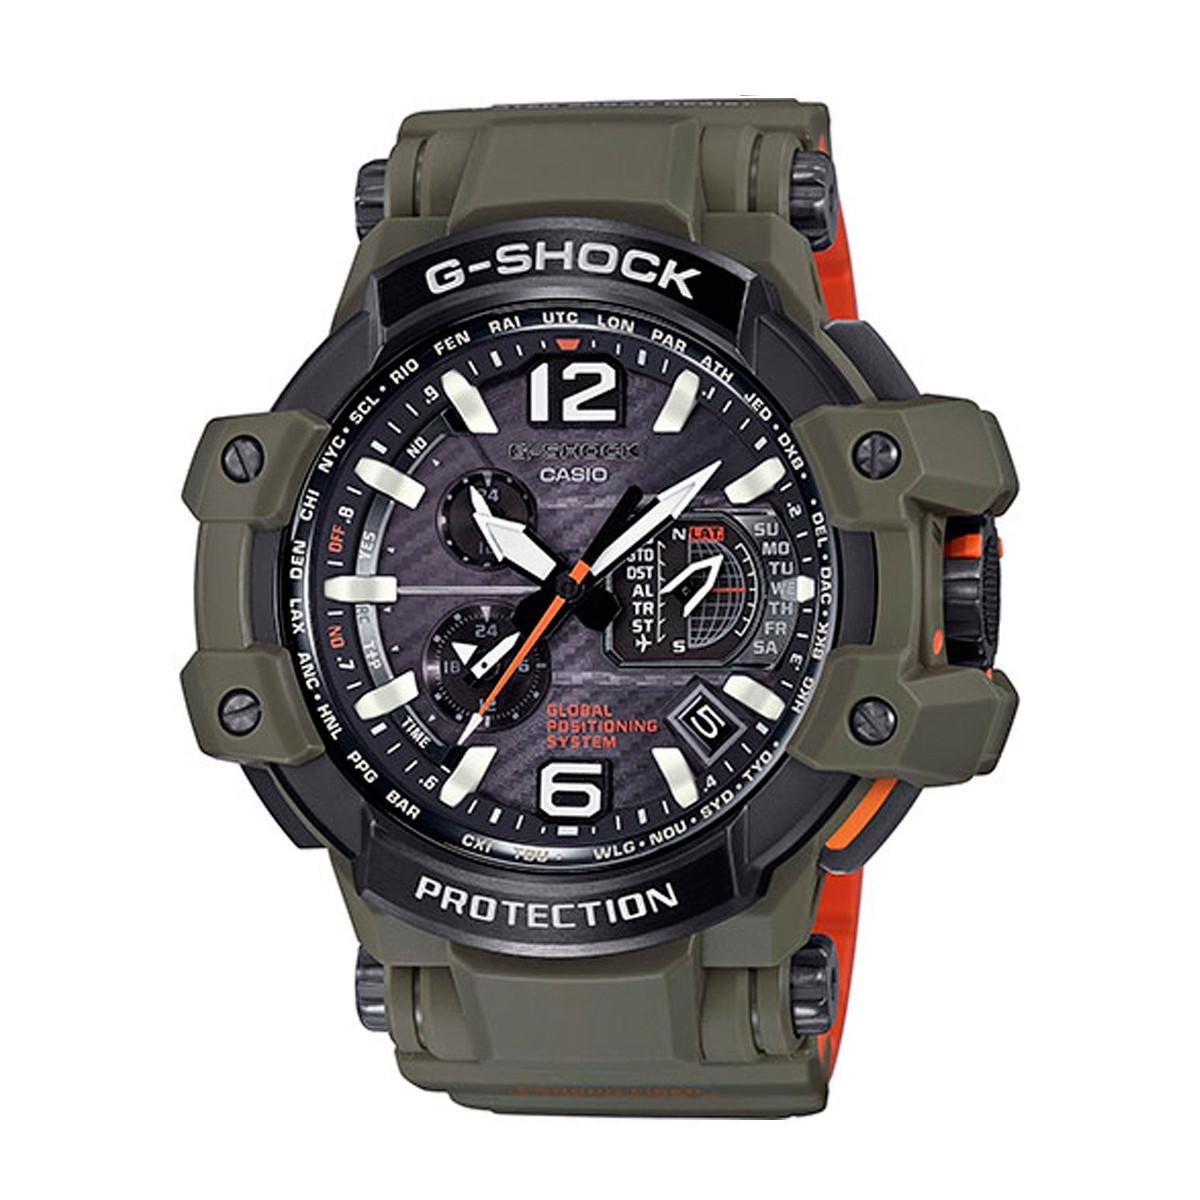 Montre CASIO G-SHOCK GPS Hybrid Wave Ceptor - GPW-1000KH-3AER